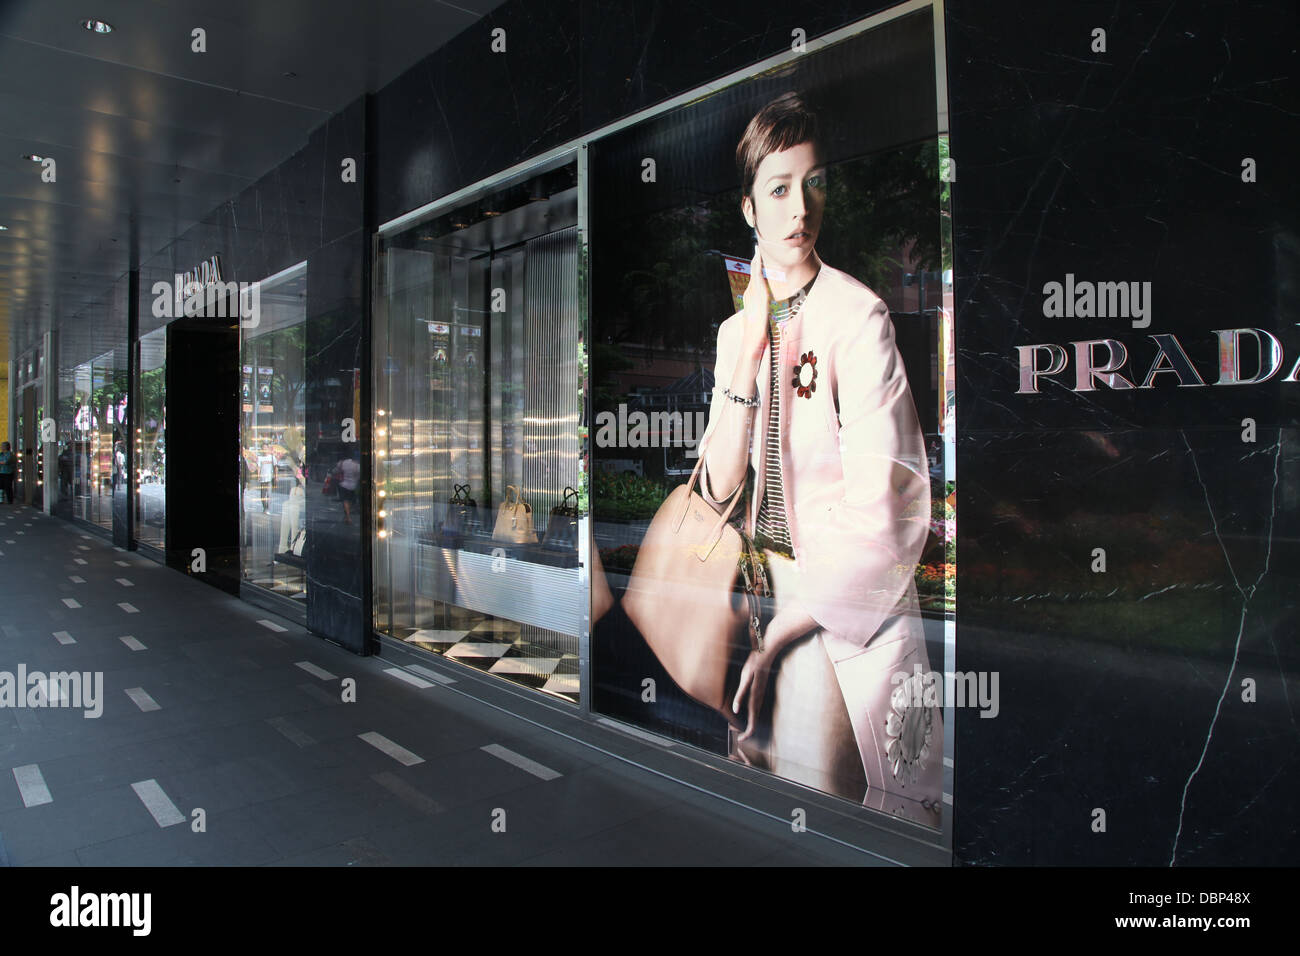 Prada shop front store singapore orchard road retail shopping - Stock Image